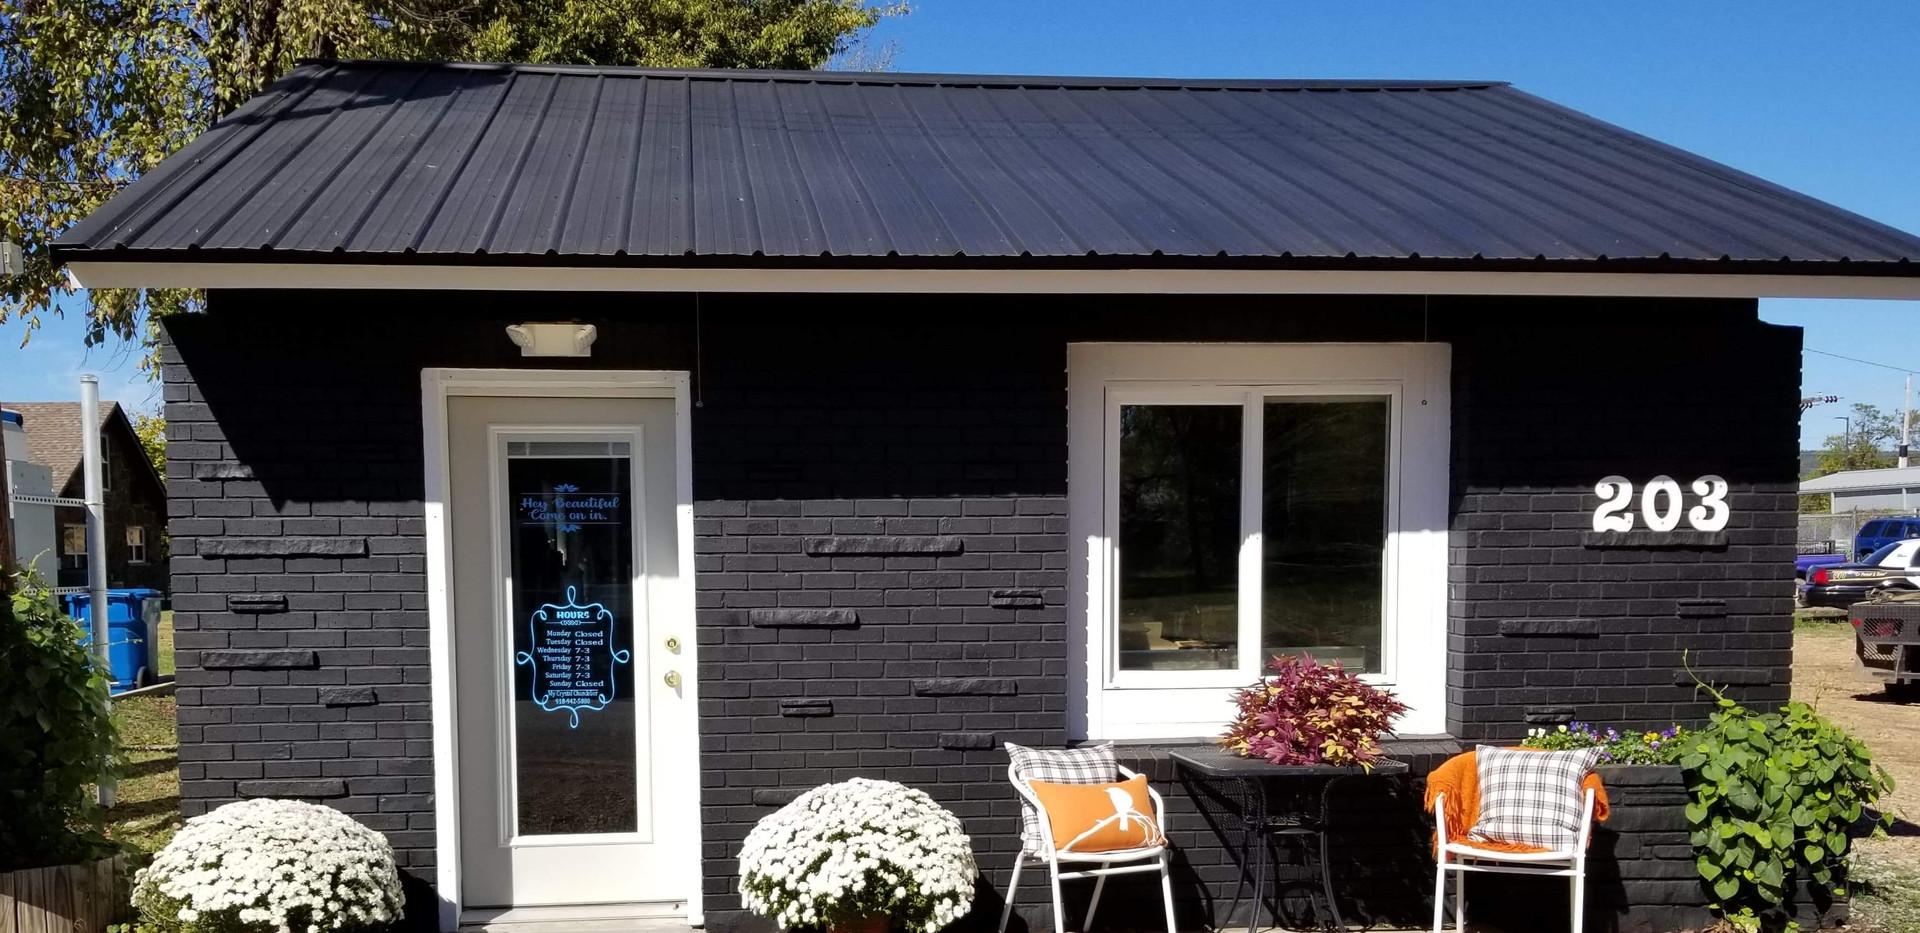 My Crystal Chandelier Coffee House & Gif